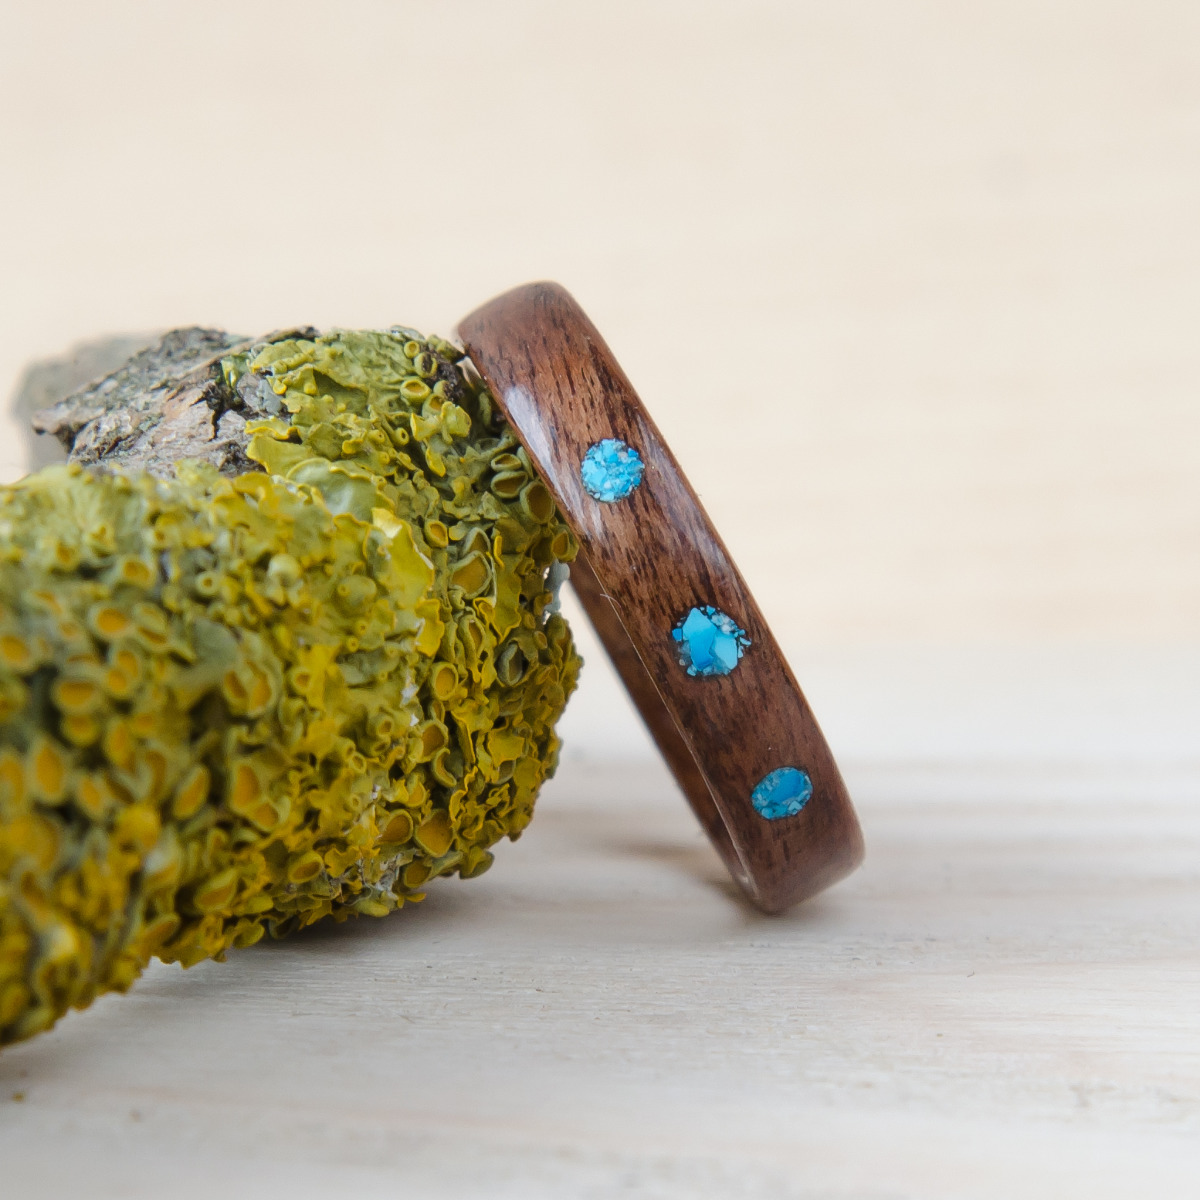 Nordwood Rings Dřevěný prstýnek ROSEWOOD HOWLITE DOTS NWR 36